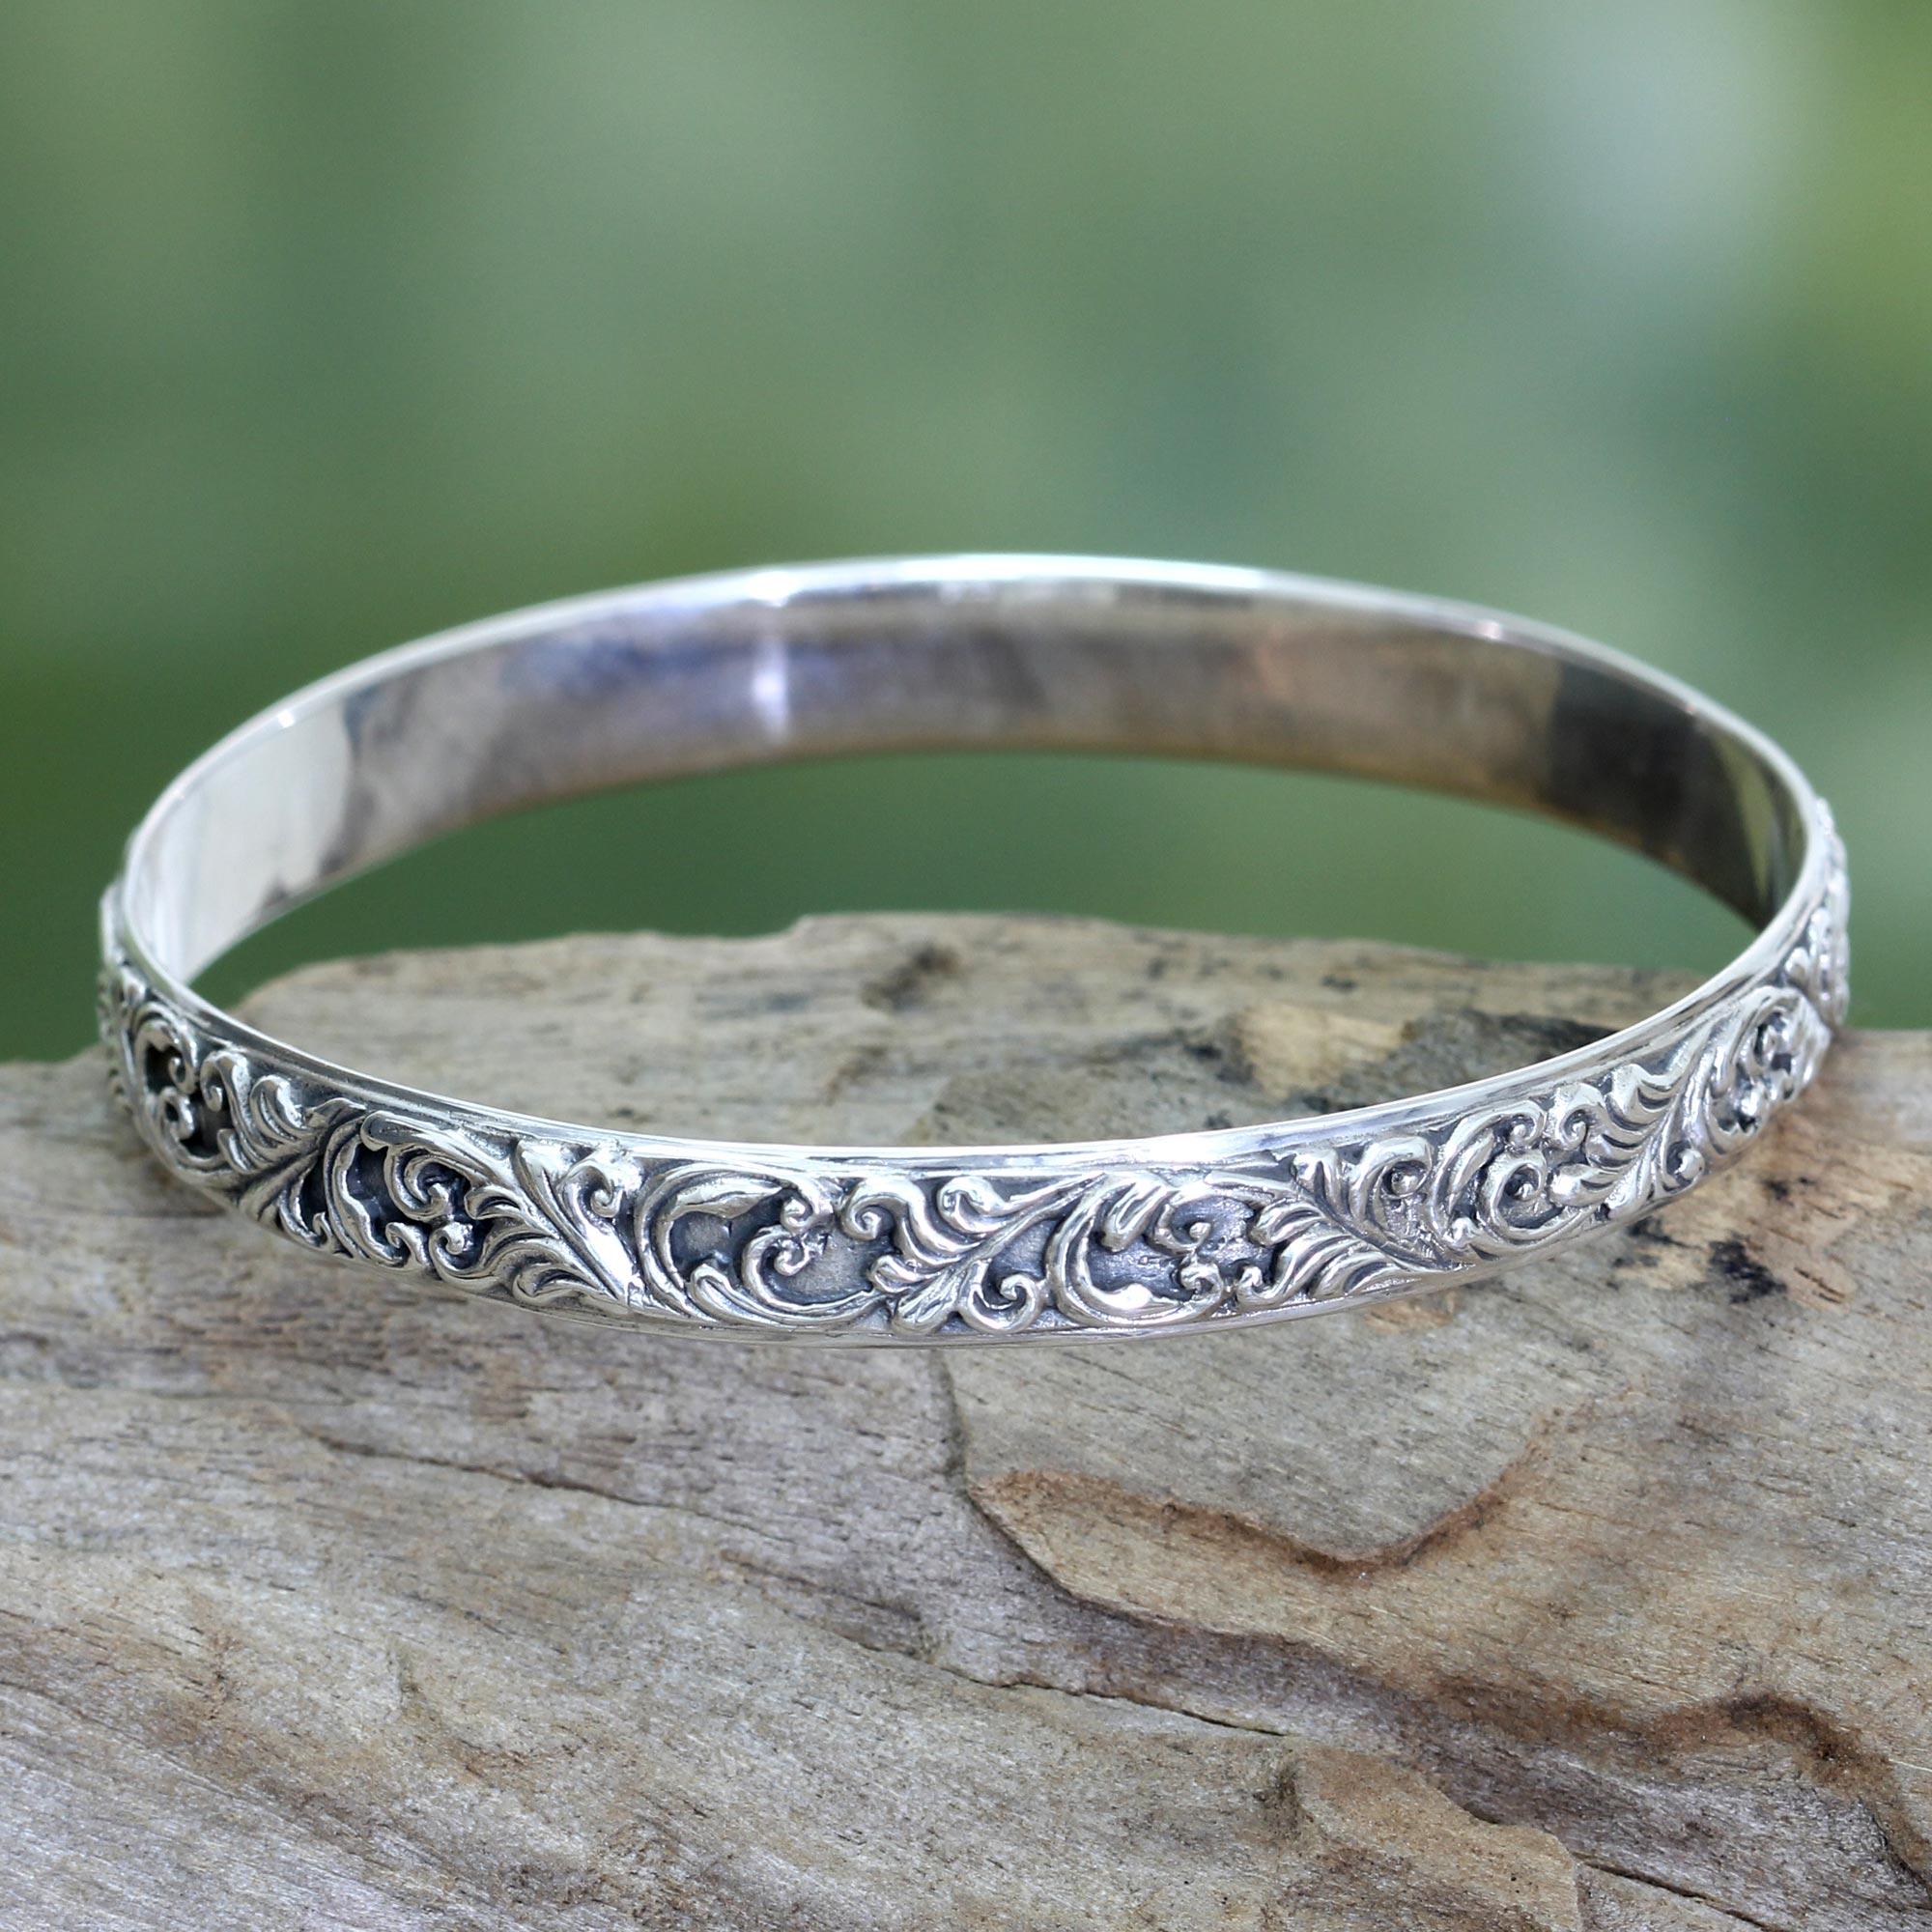 77dbb0ee176a5 Artisan Jewelry Sterling Silver Bangle Bracelet, 'Timeless Bali'